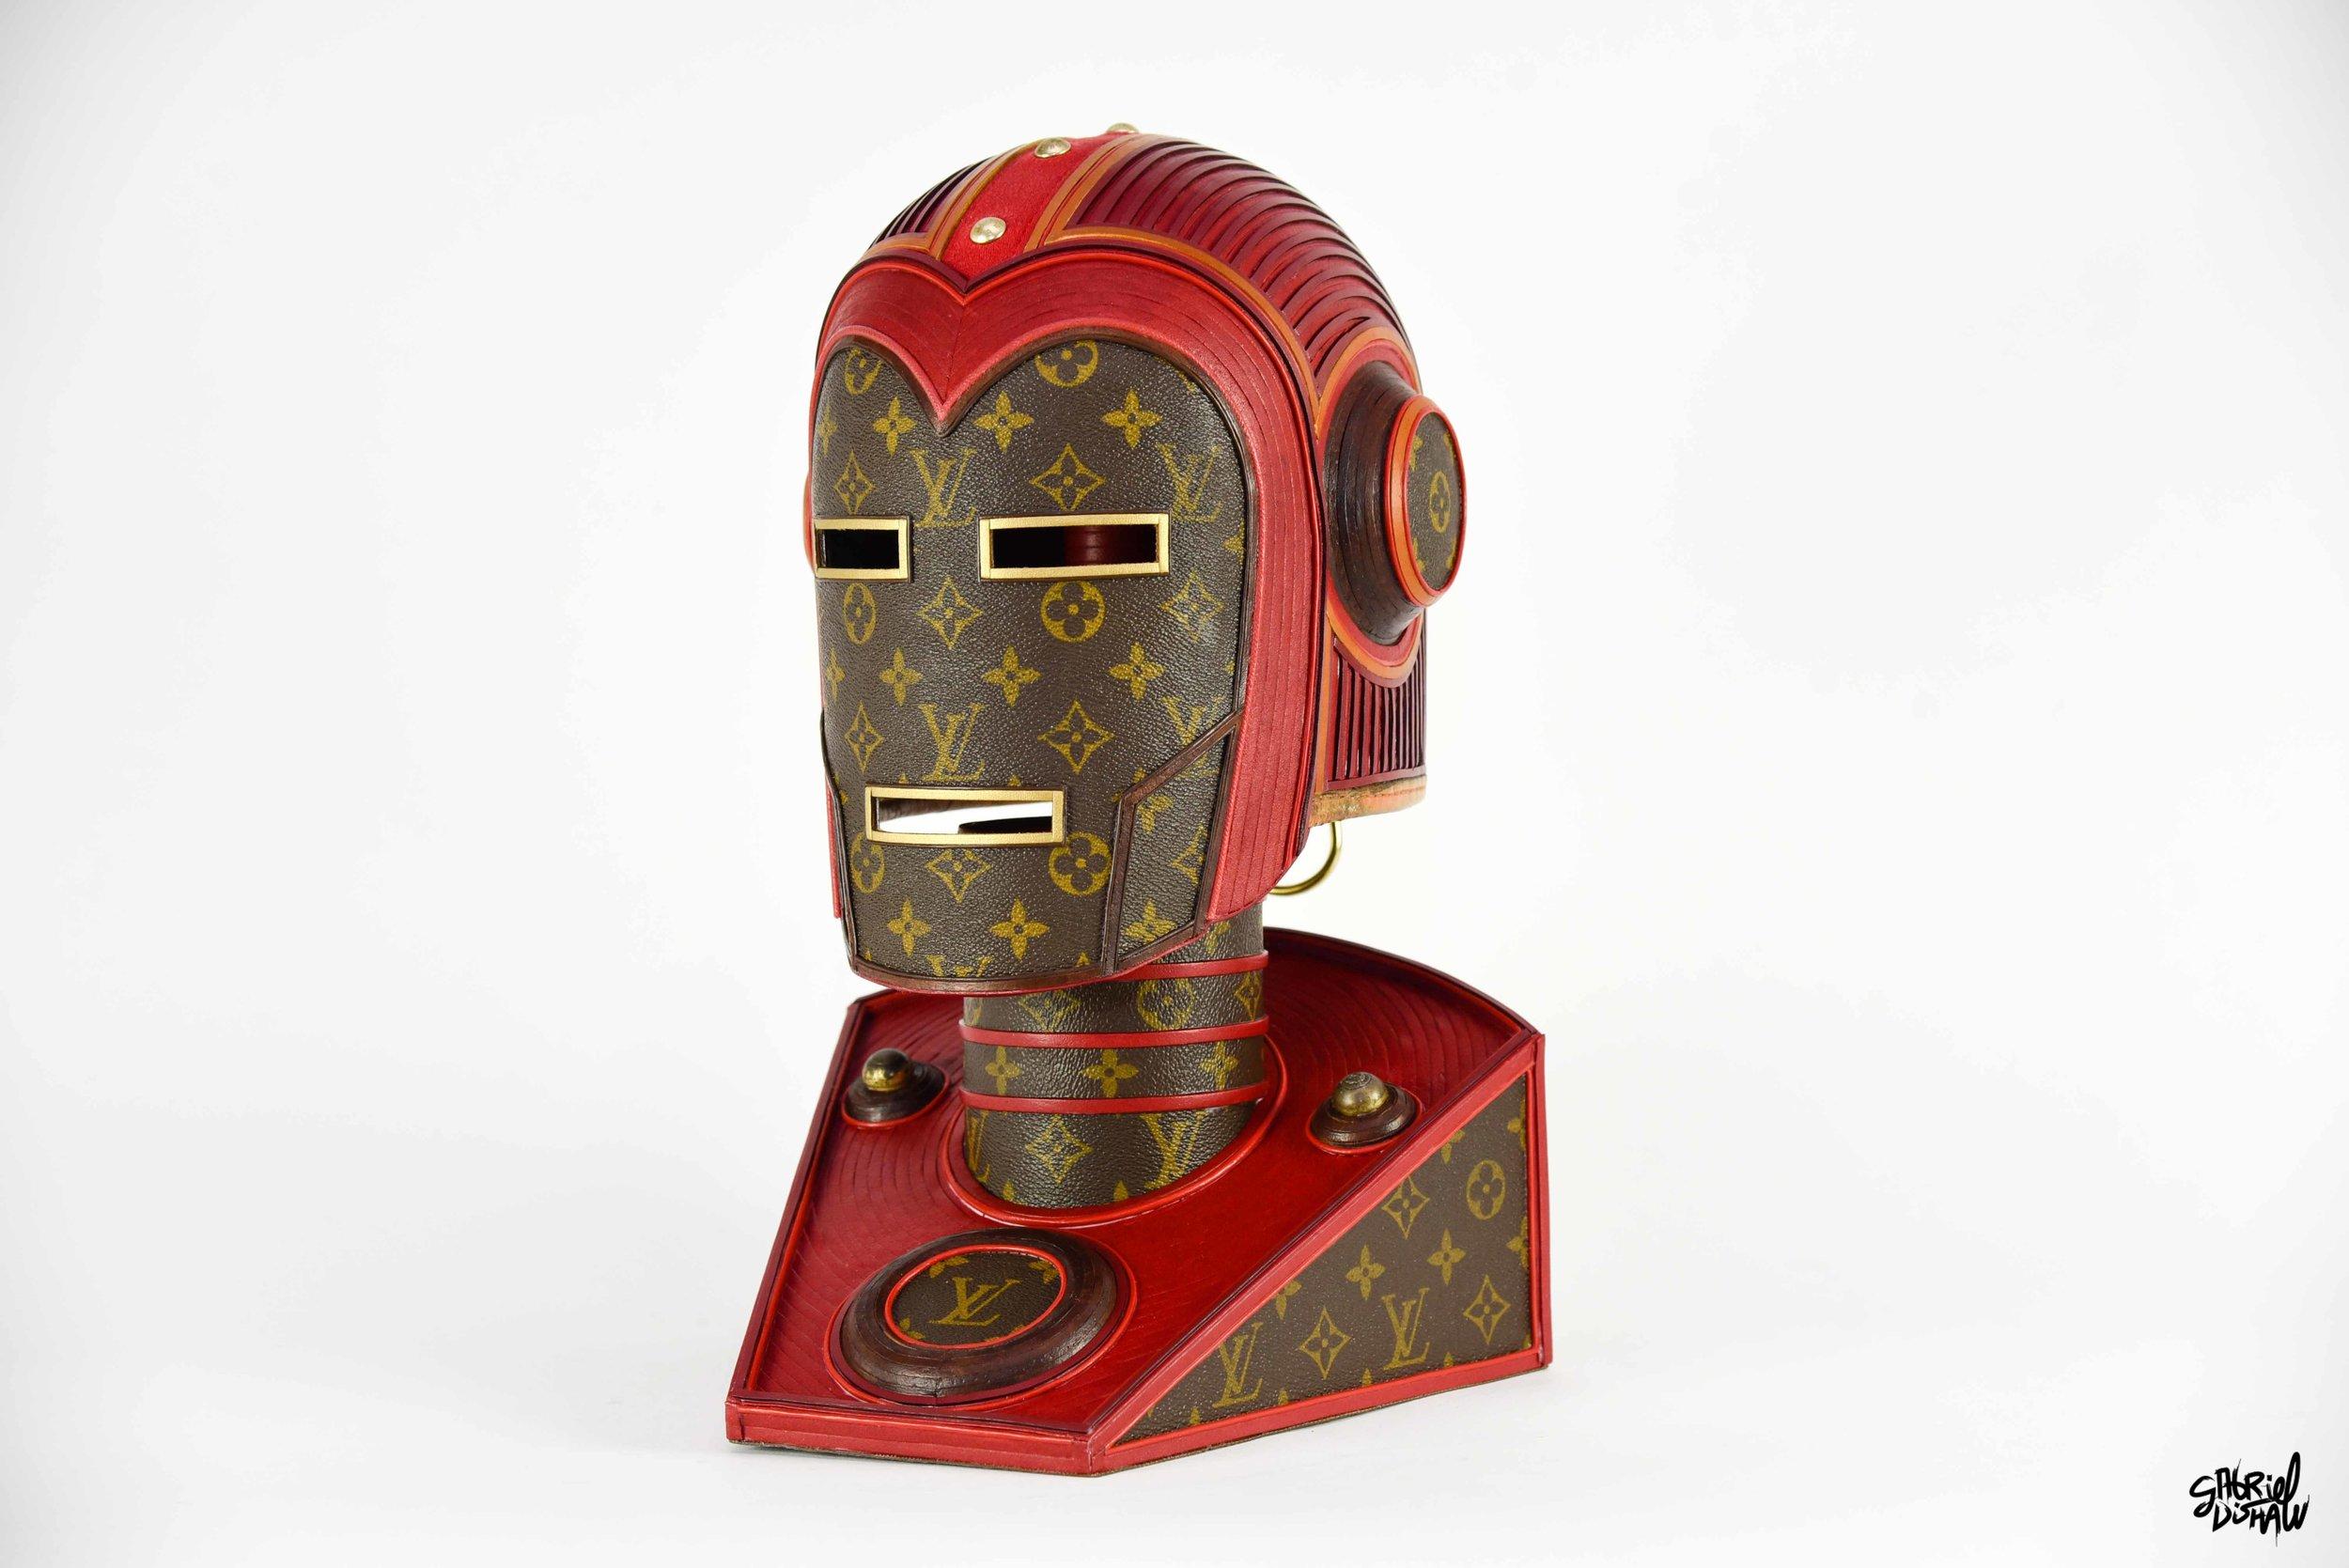 Gabriel Dishaw Vintage Iron Man LV-0201.jpg